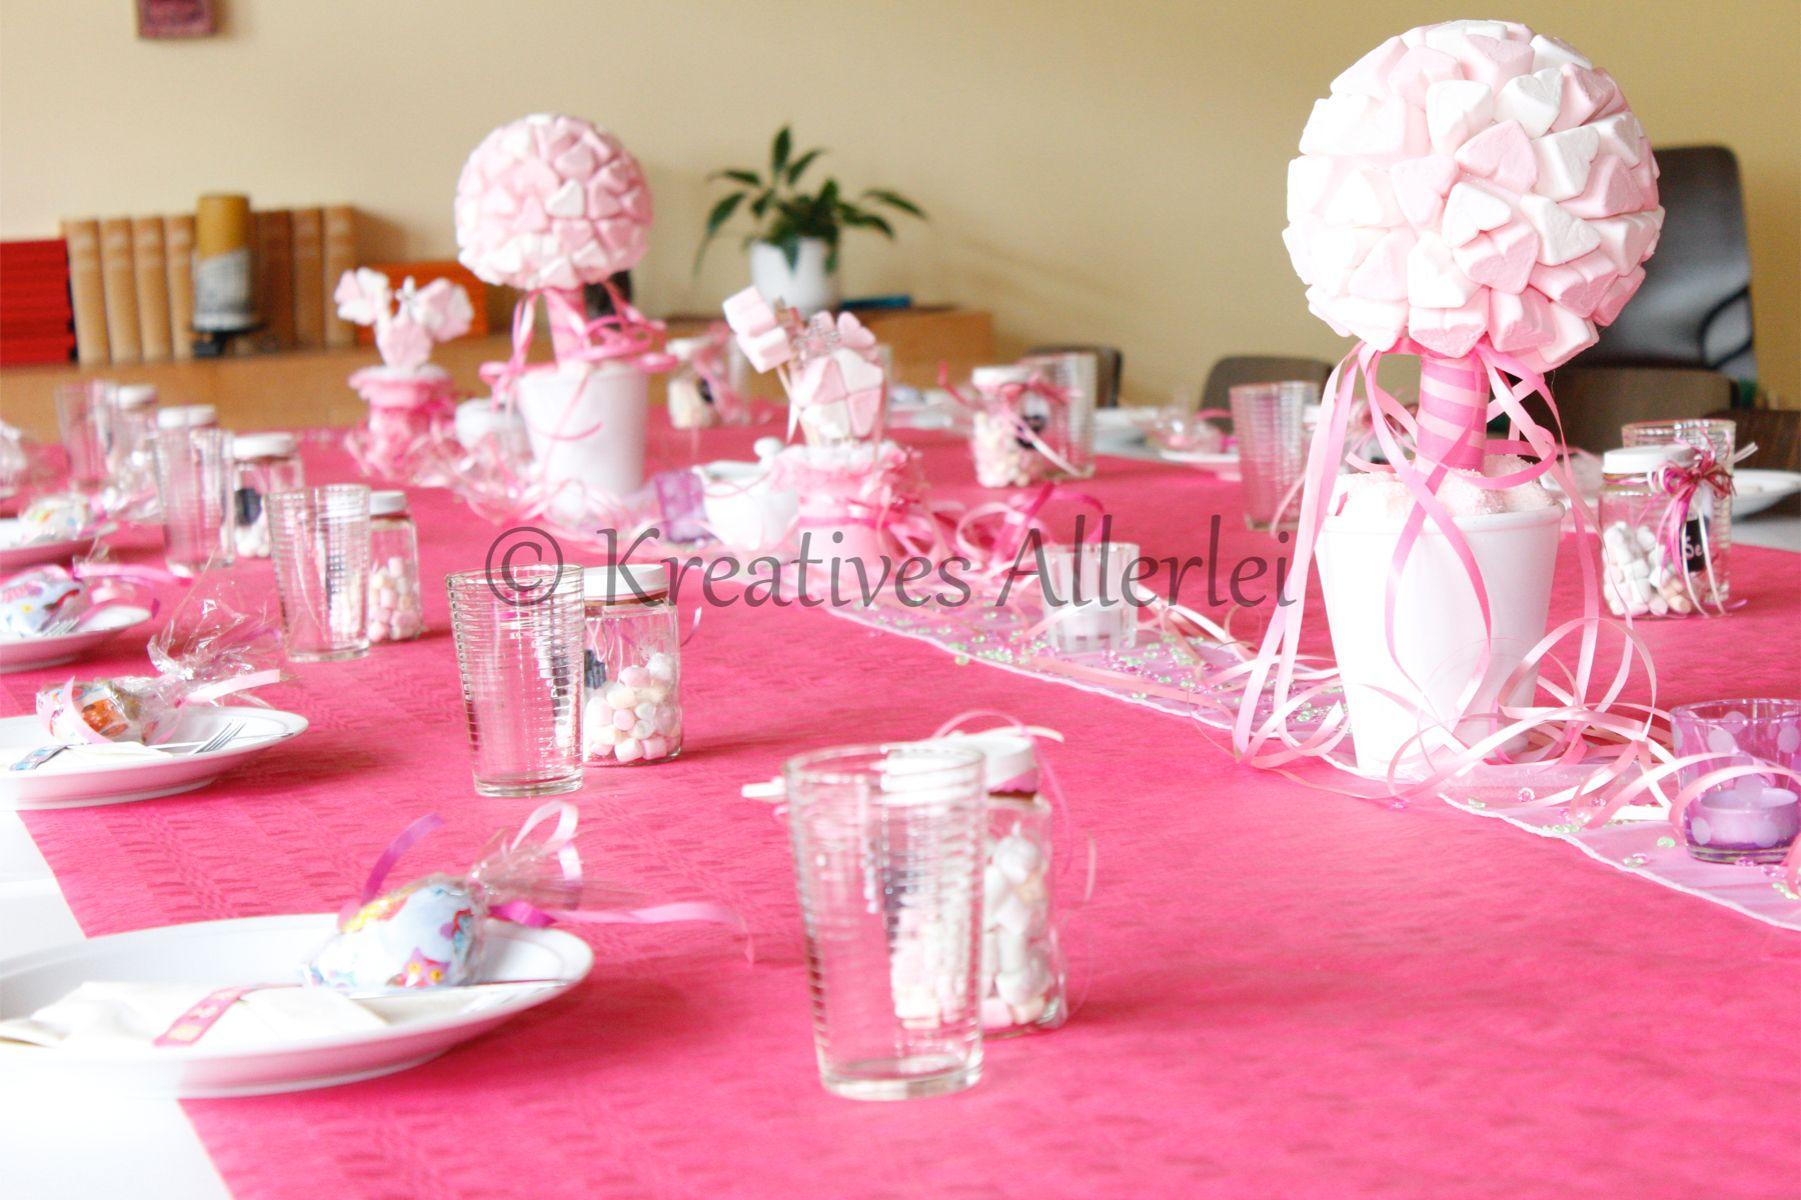 Tischdeko Taufe Ideen Tischdeko Taufe Blumen Pinterest Ein Katalog